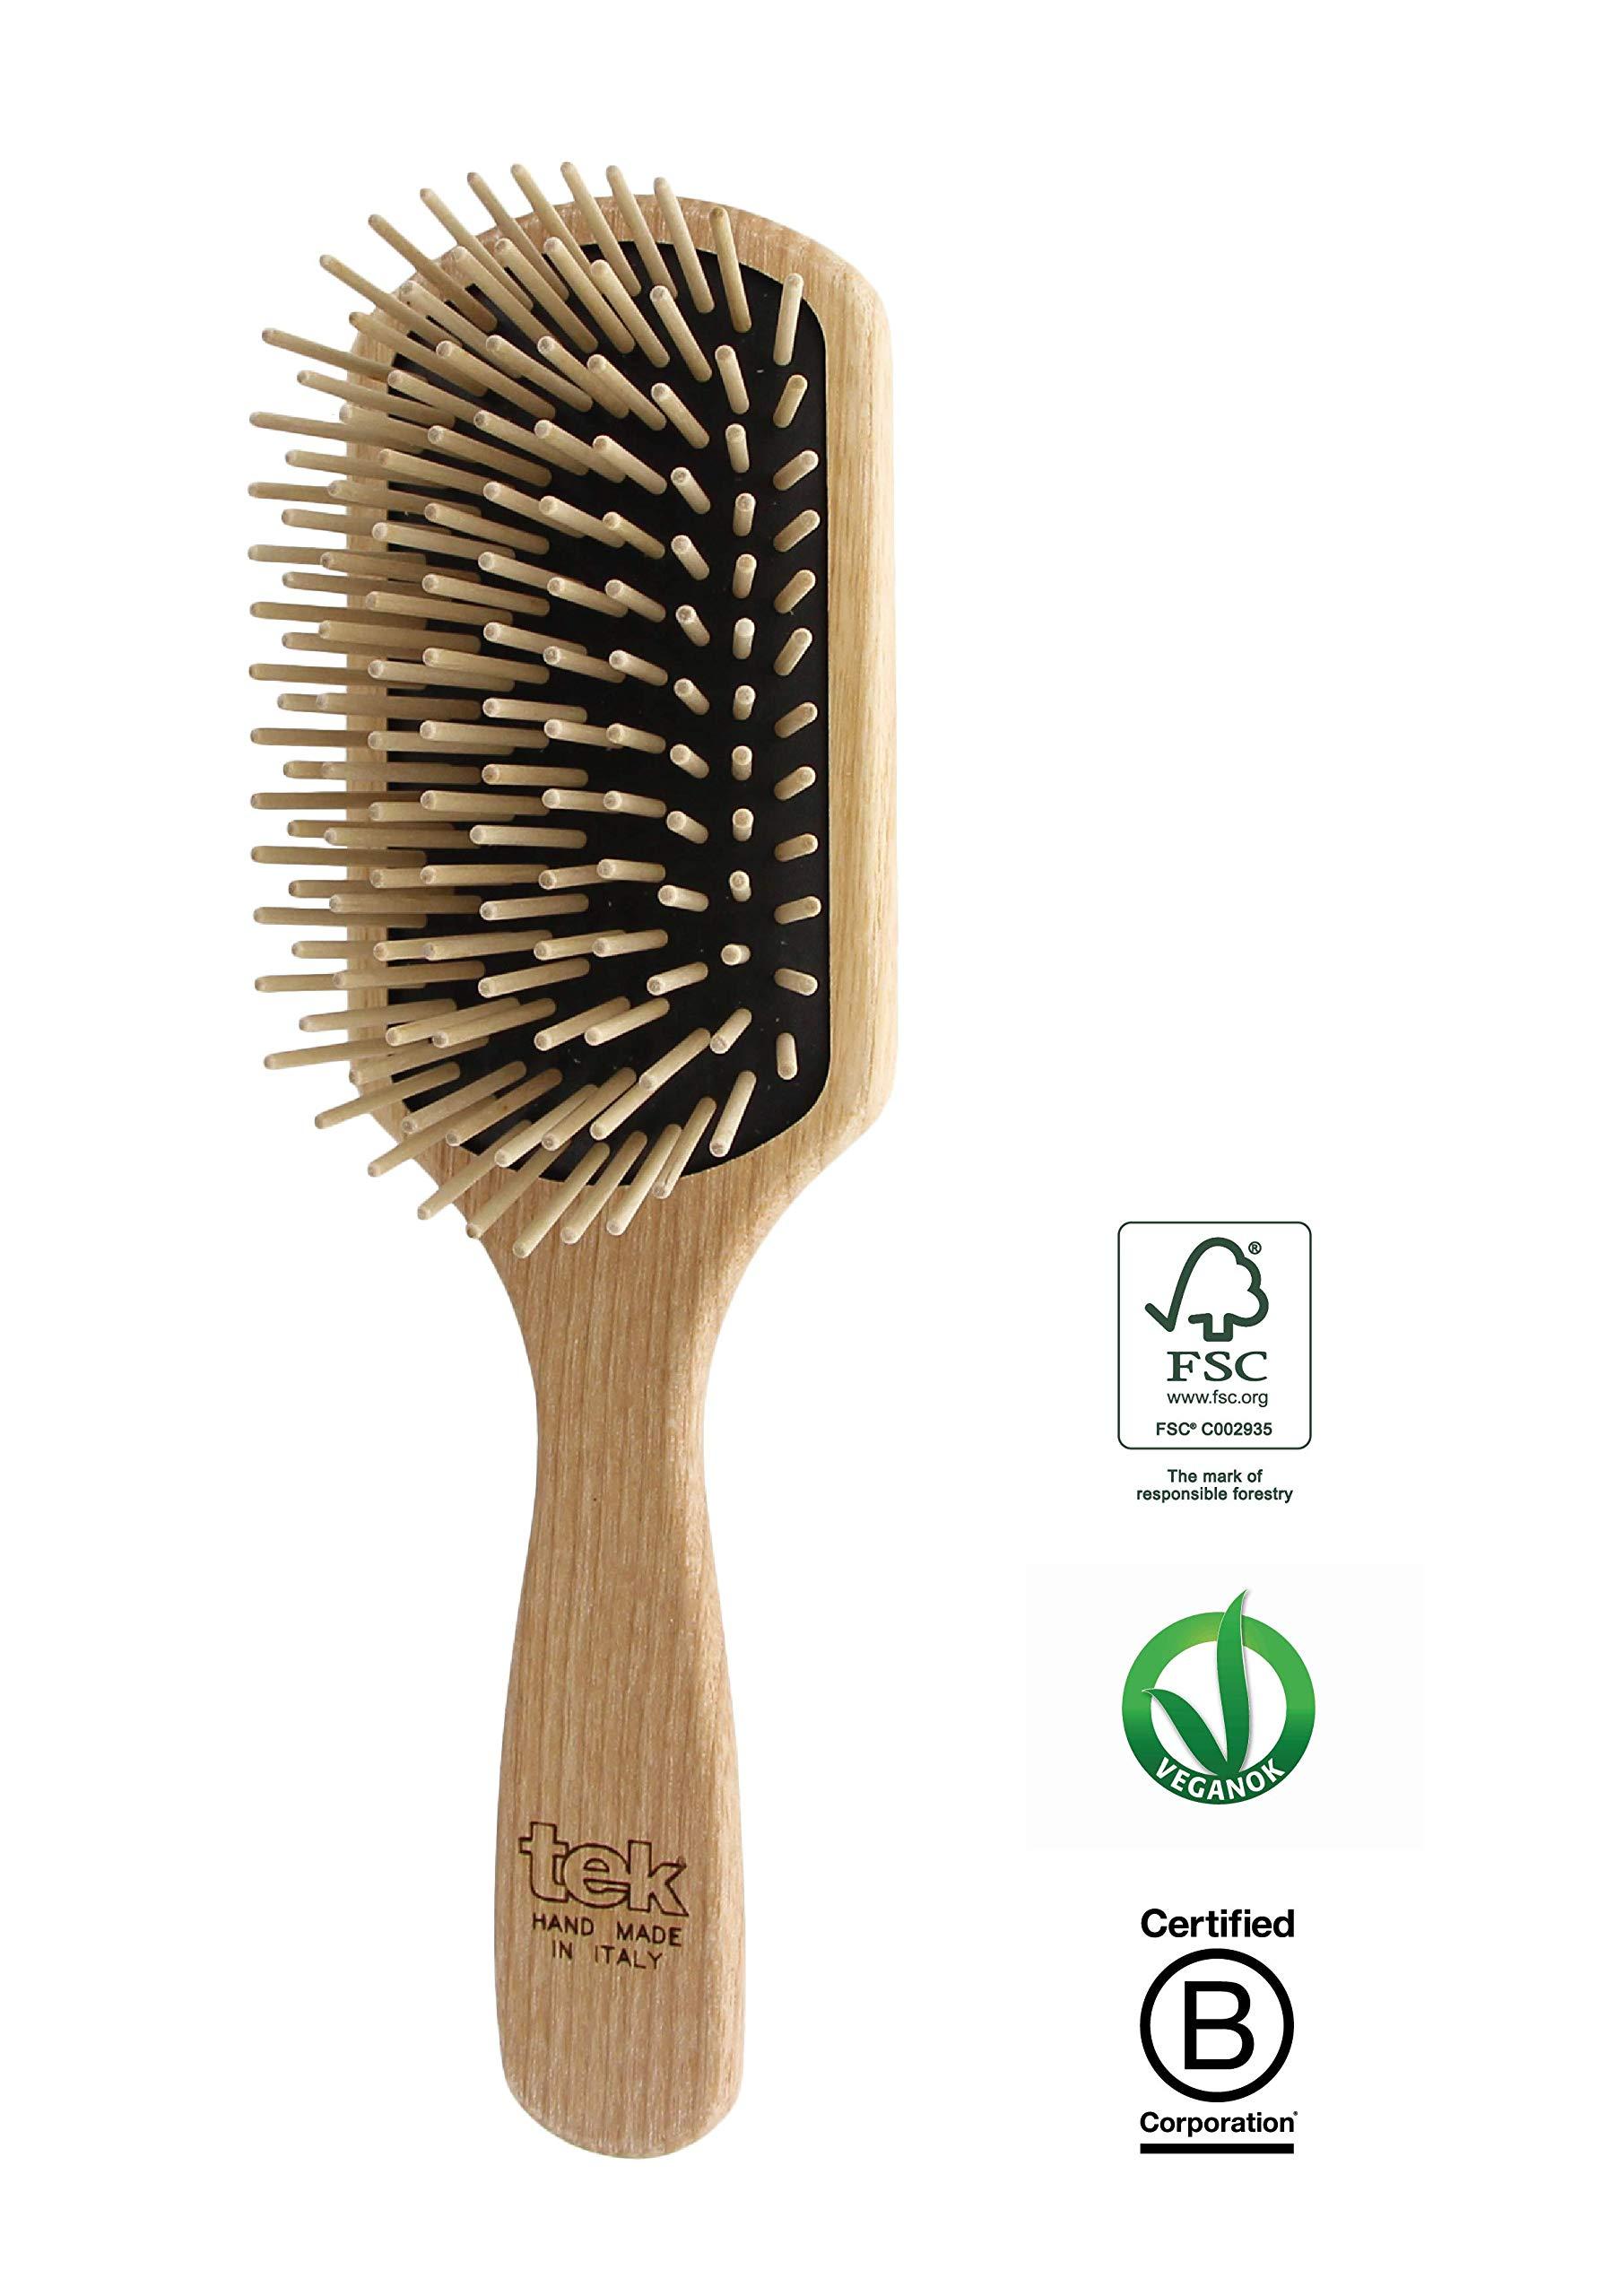 Tek paddle hair brush in ash wood with long pins - Handmade in Italy by TEK